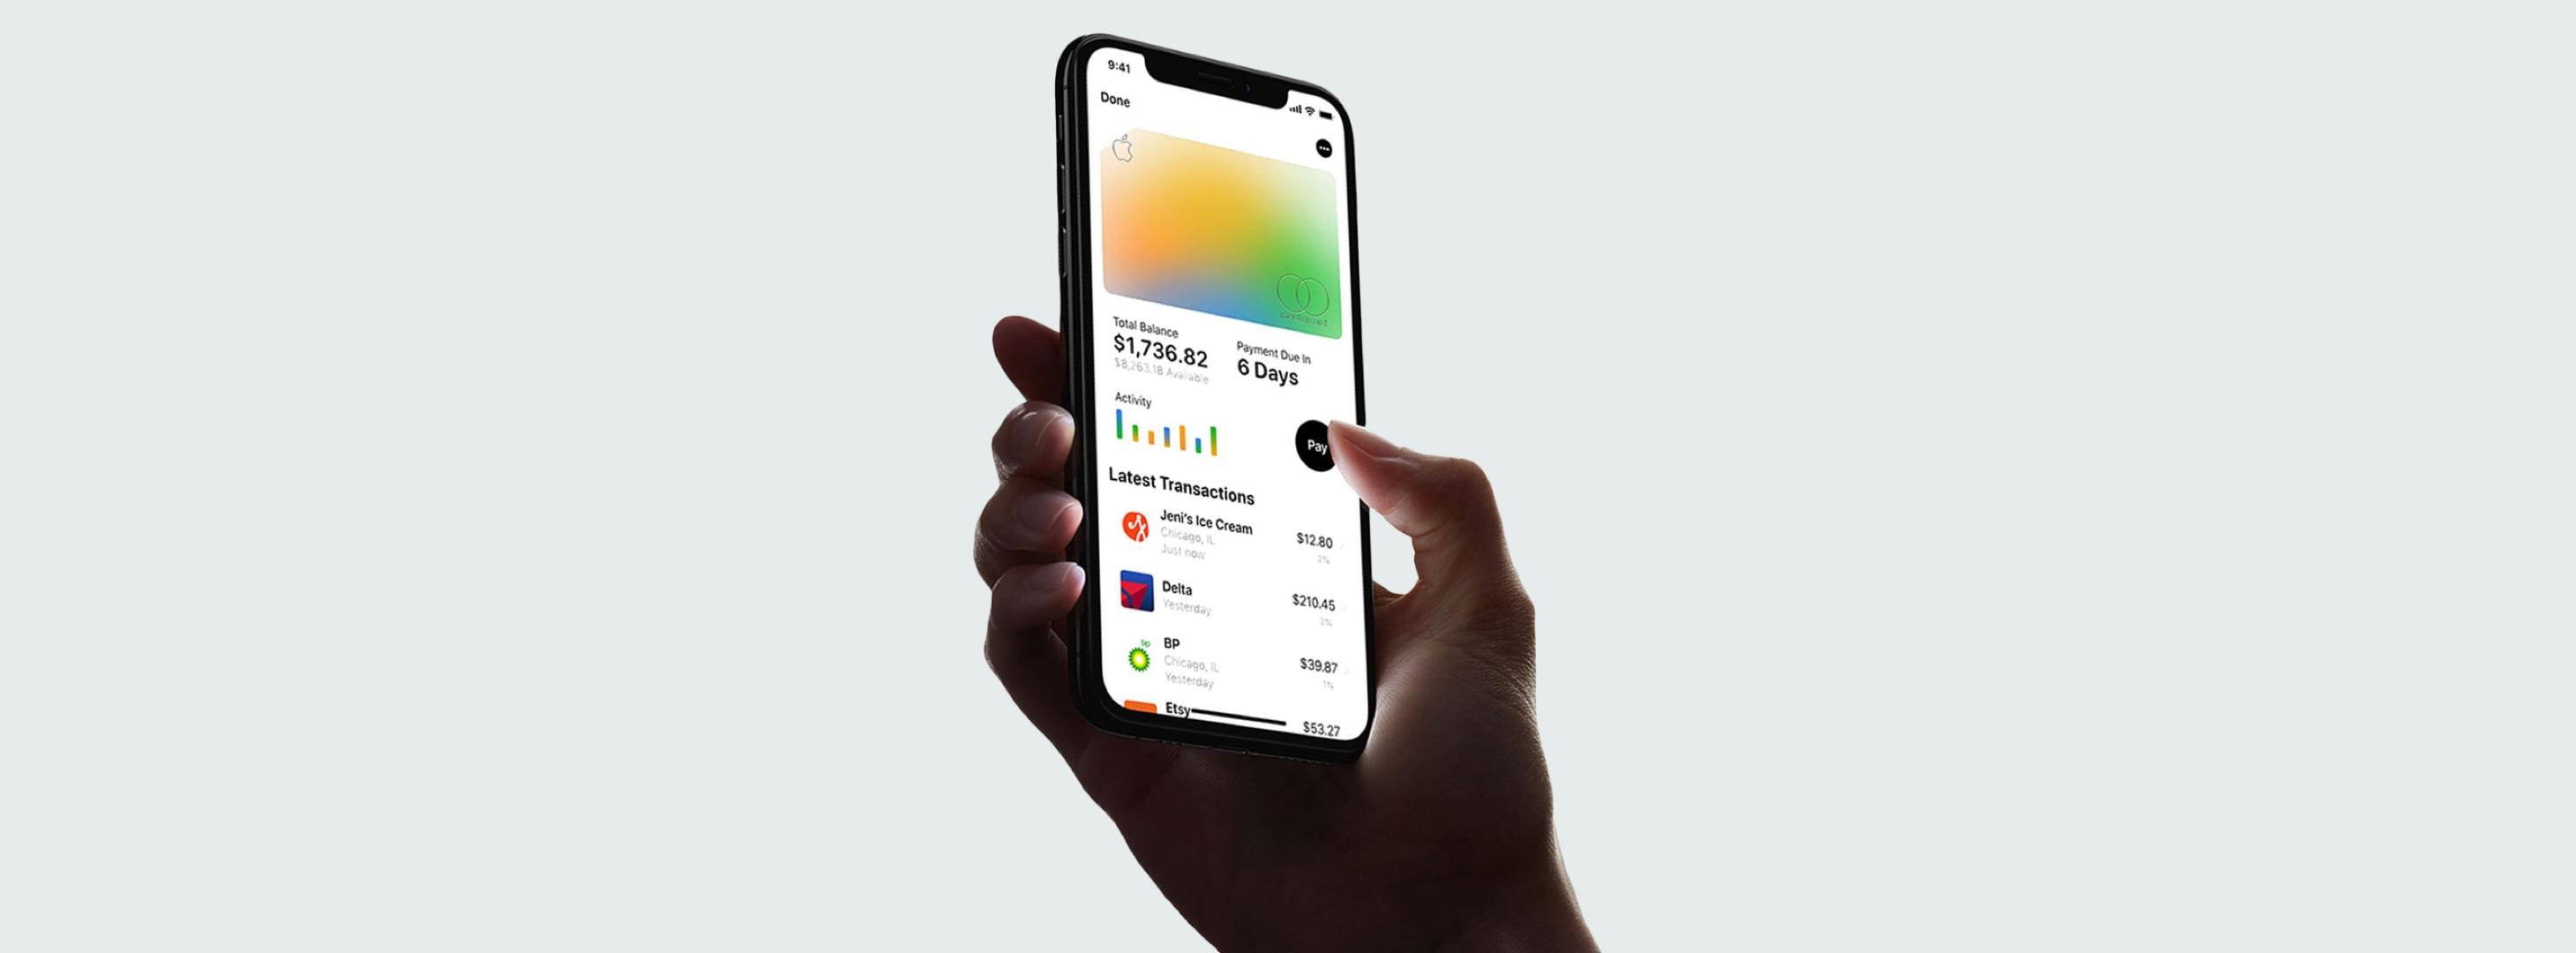 allapplenews-apple-card-iphone-screen